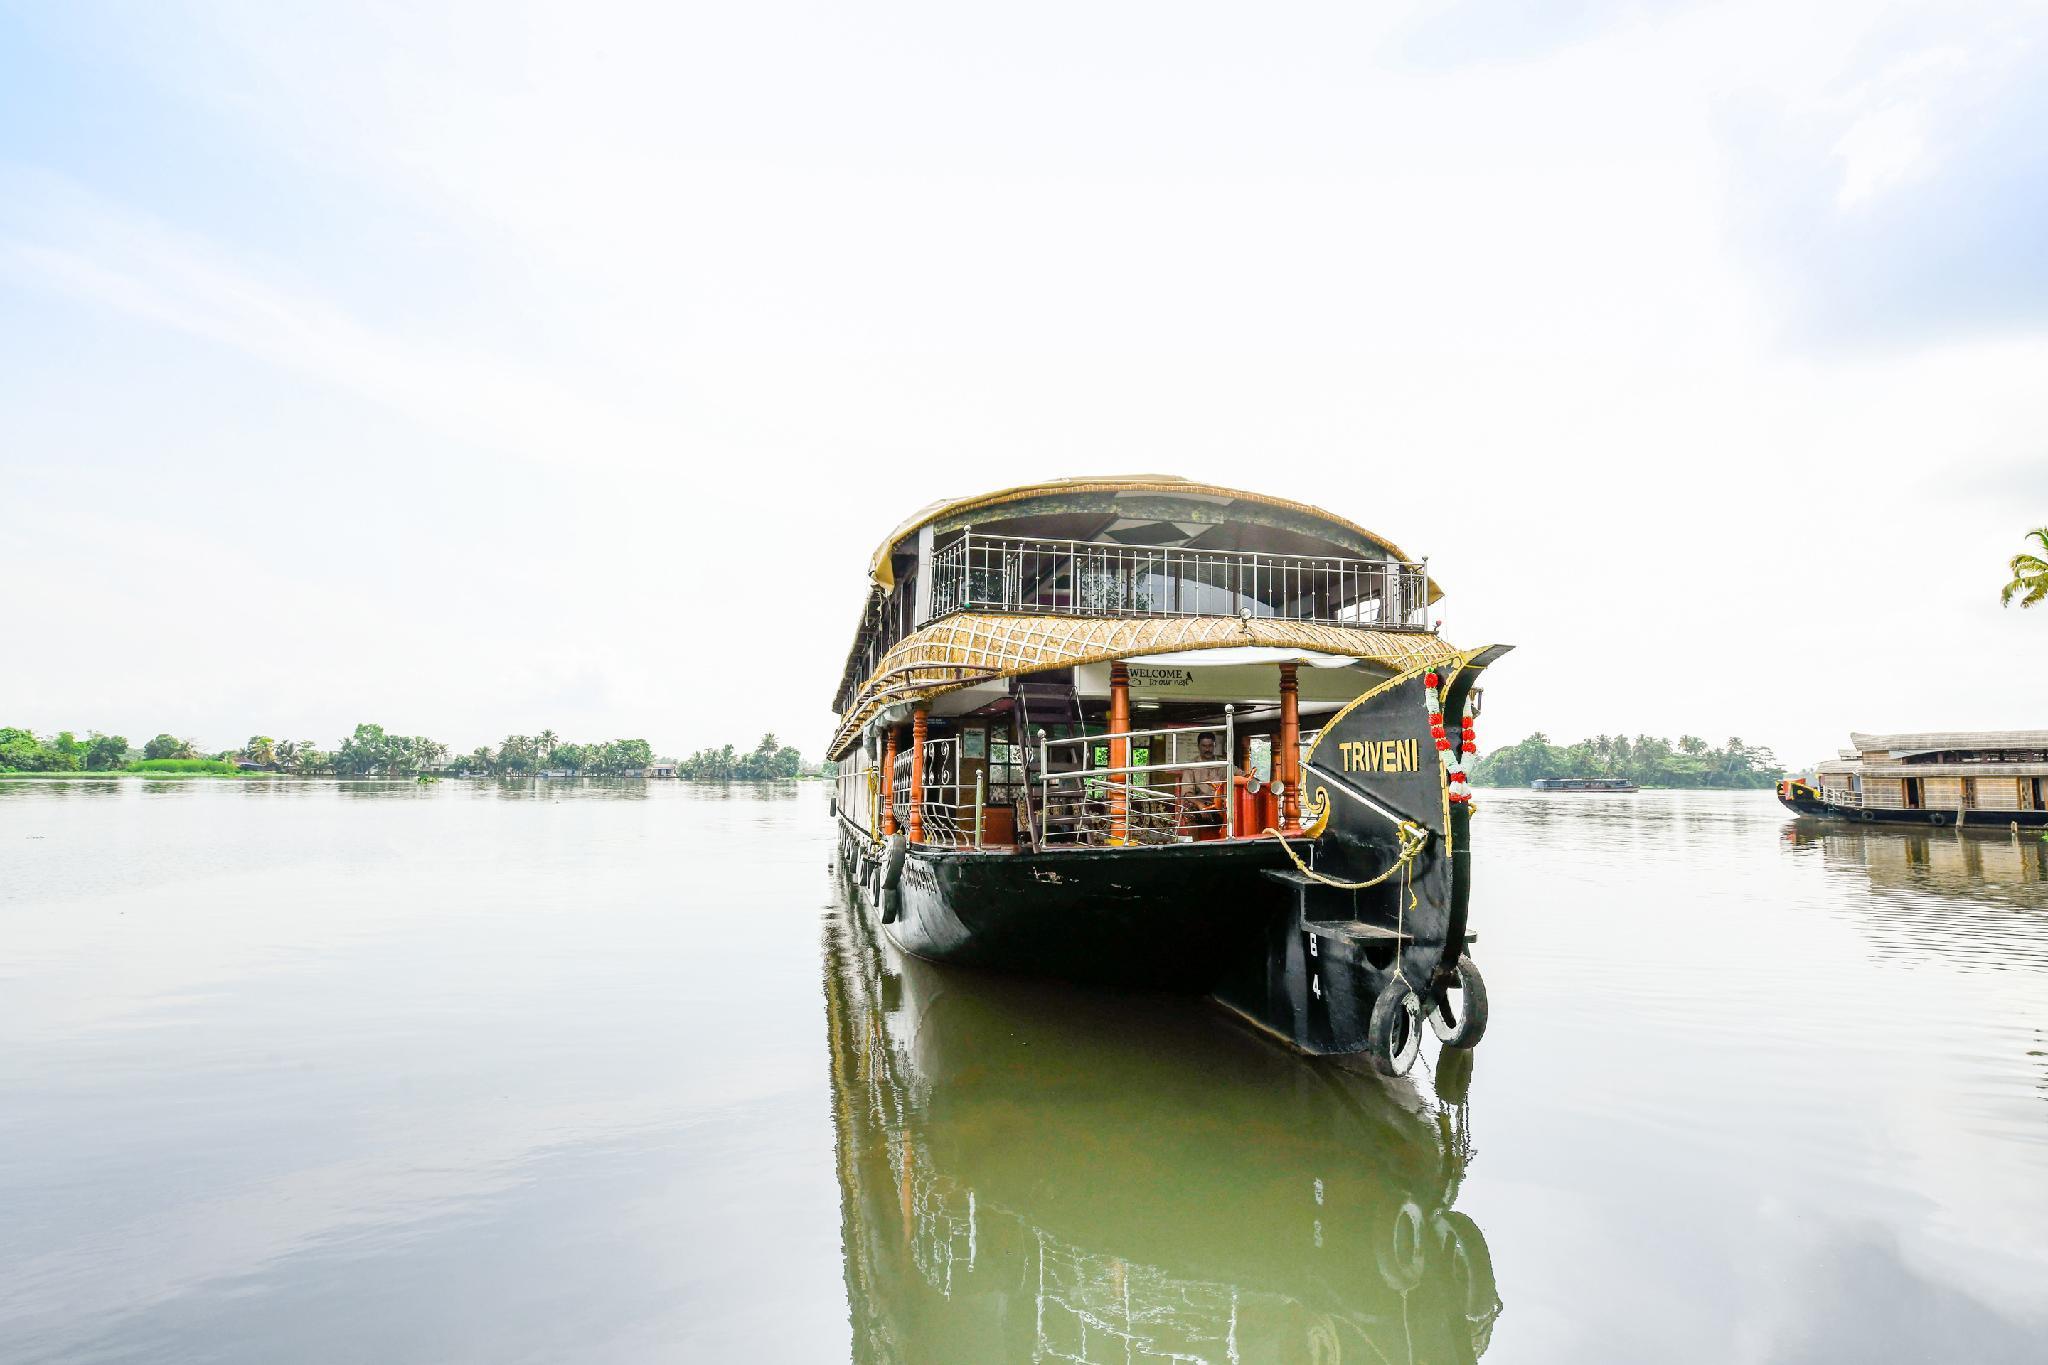 OYO 22647 Houseboat Triveni, Alappuzha